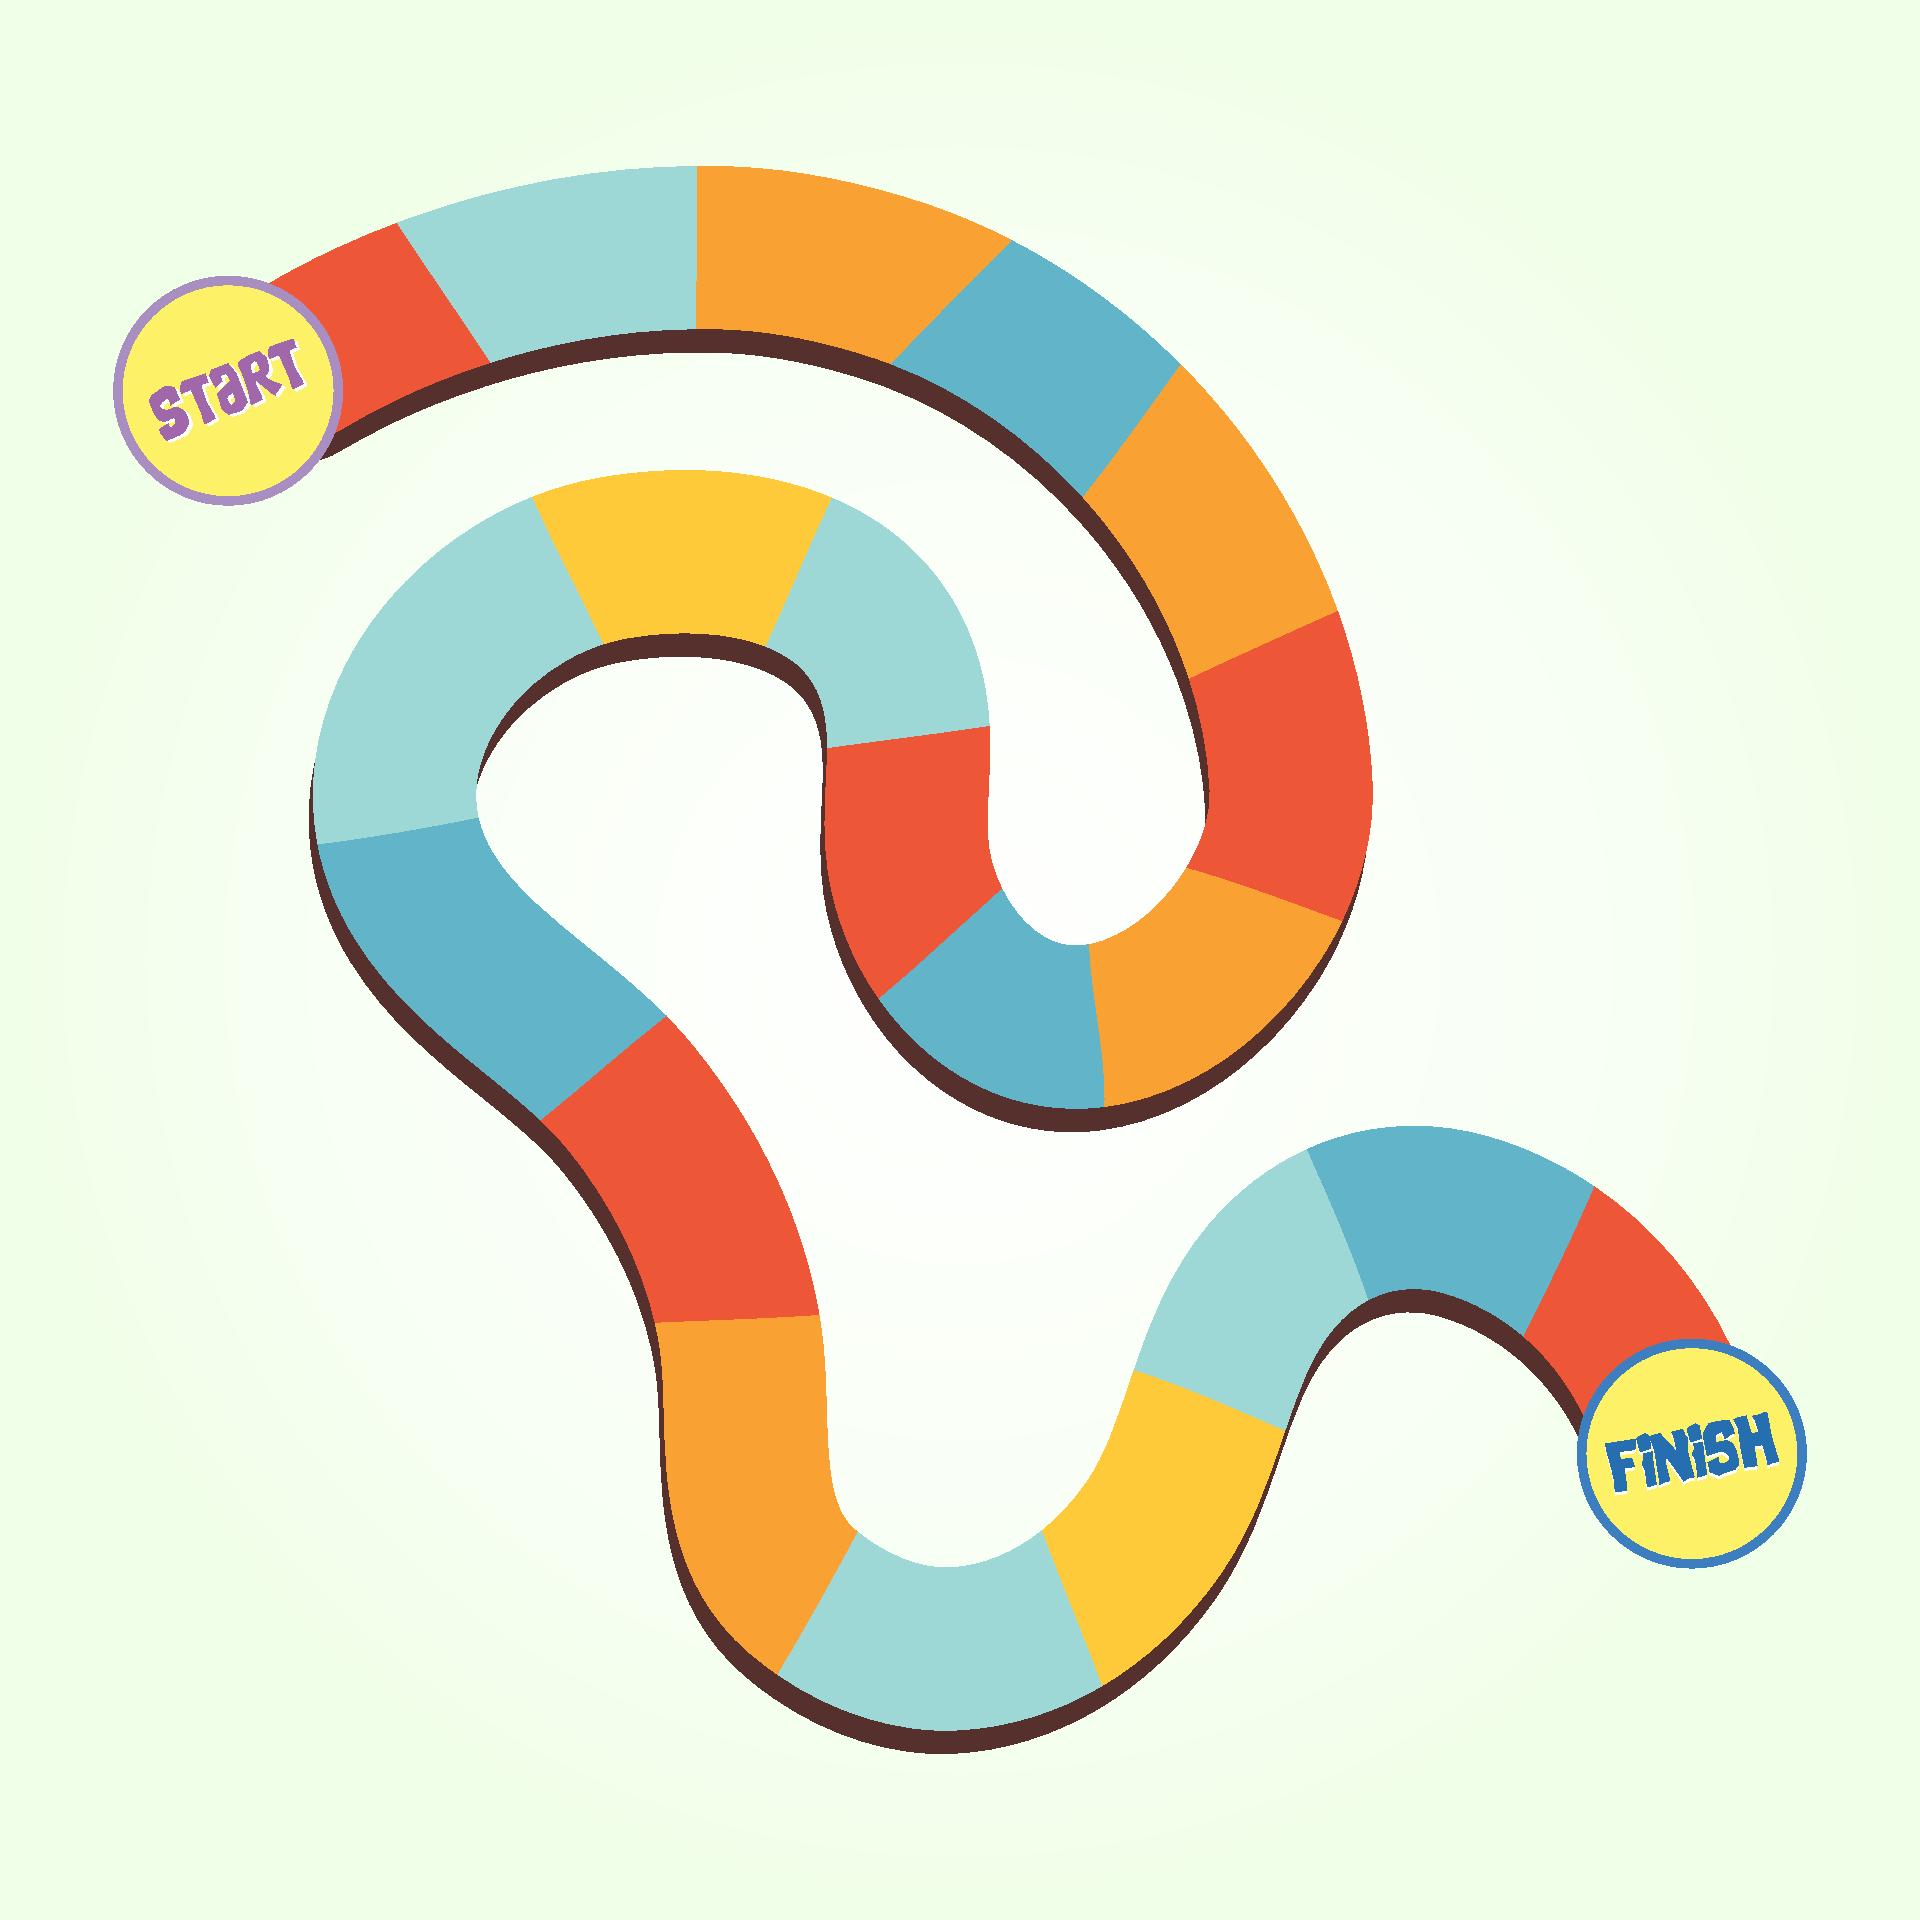 Free Printable Blank Board Games